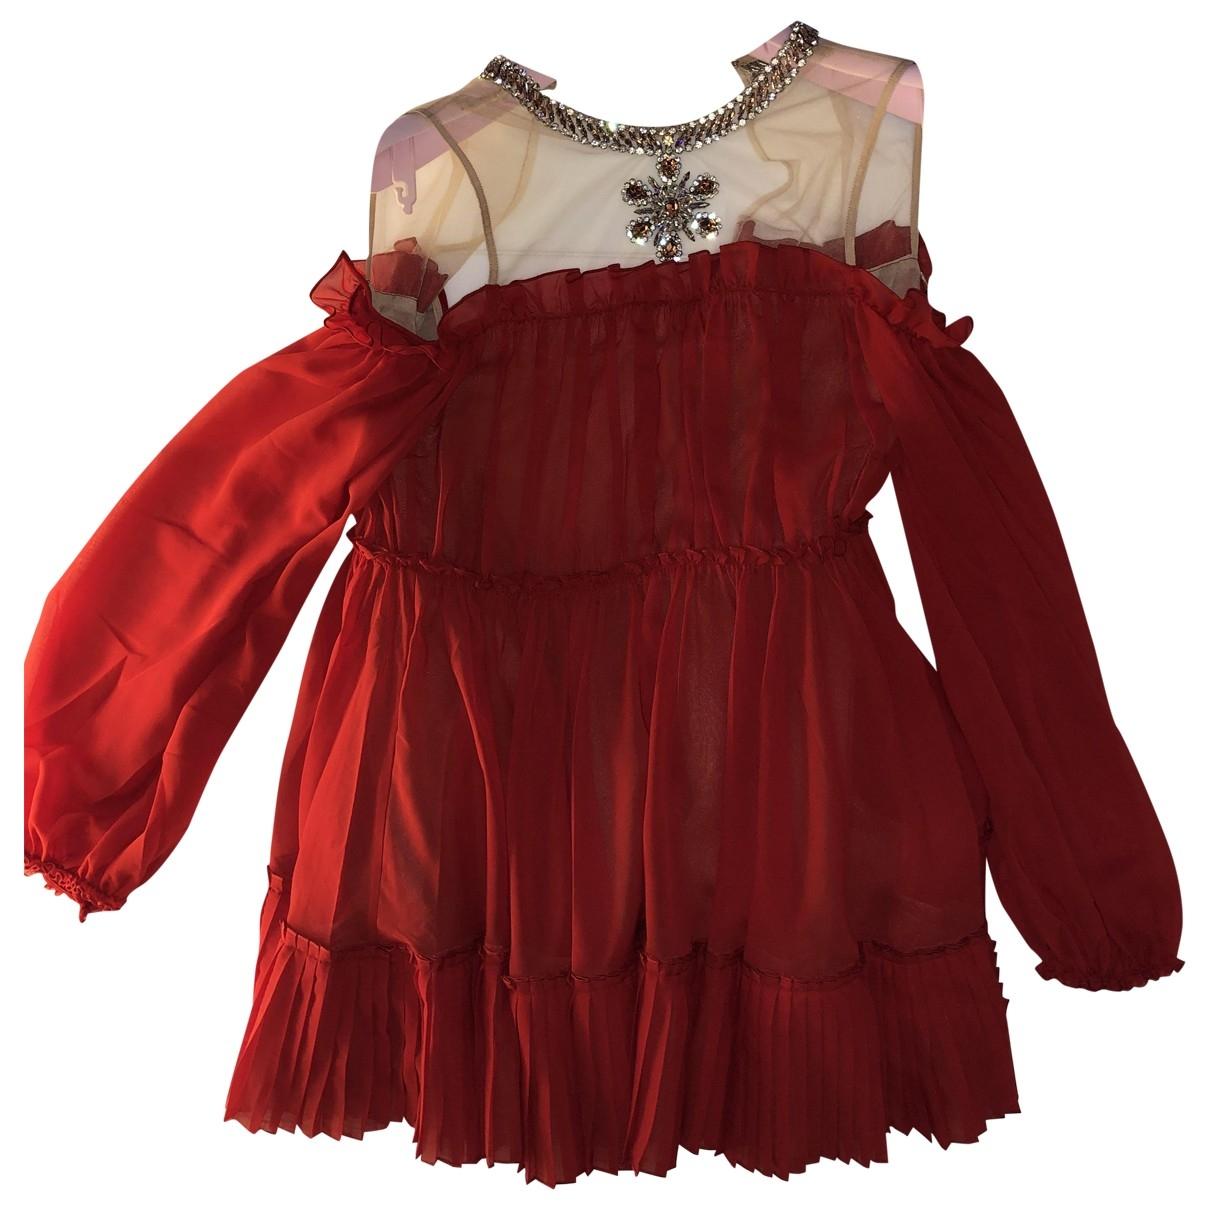 Giambattista Valli X H&m \N Red dress for Women XXS International